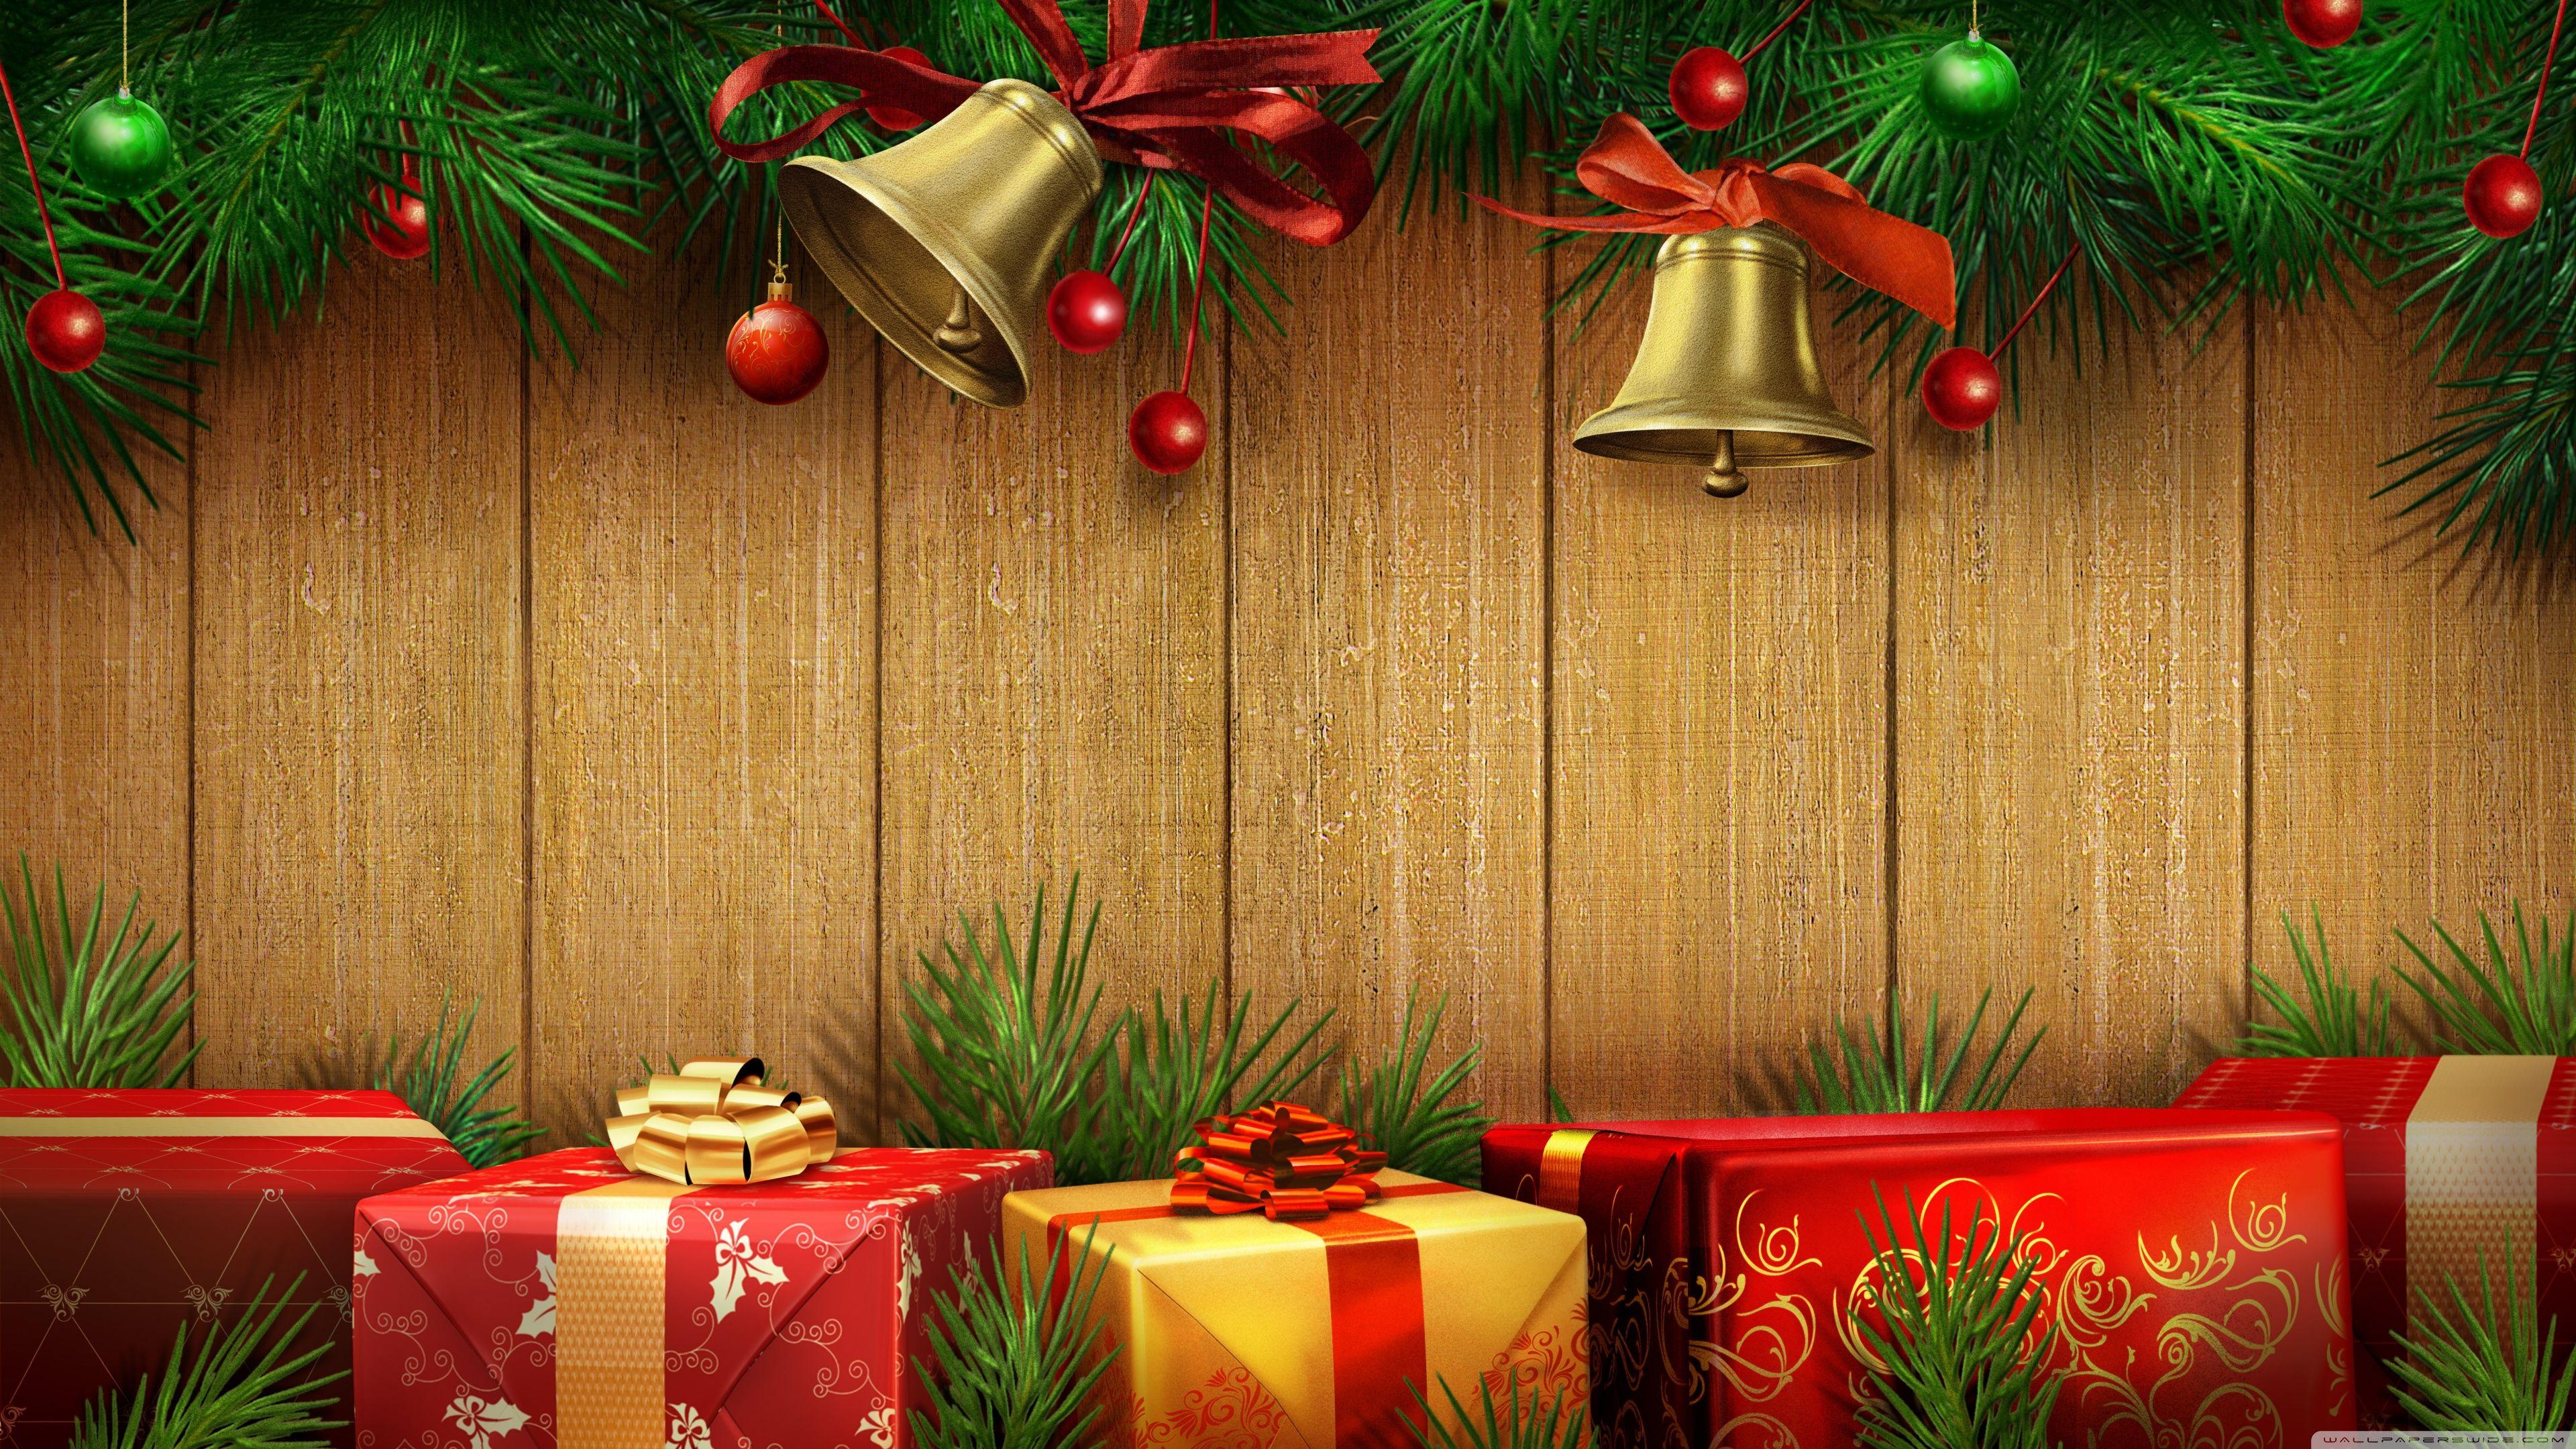 Fondos De Pantalla Hd Navidad 2016: Fondos Navideños Para Portada De Facebook Para Pantalla